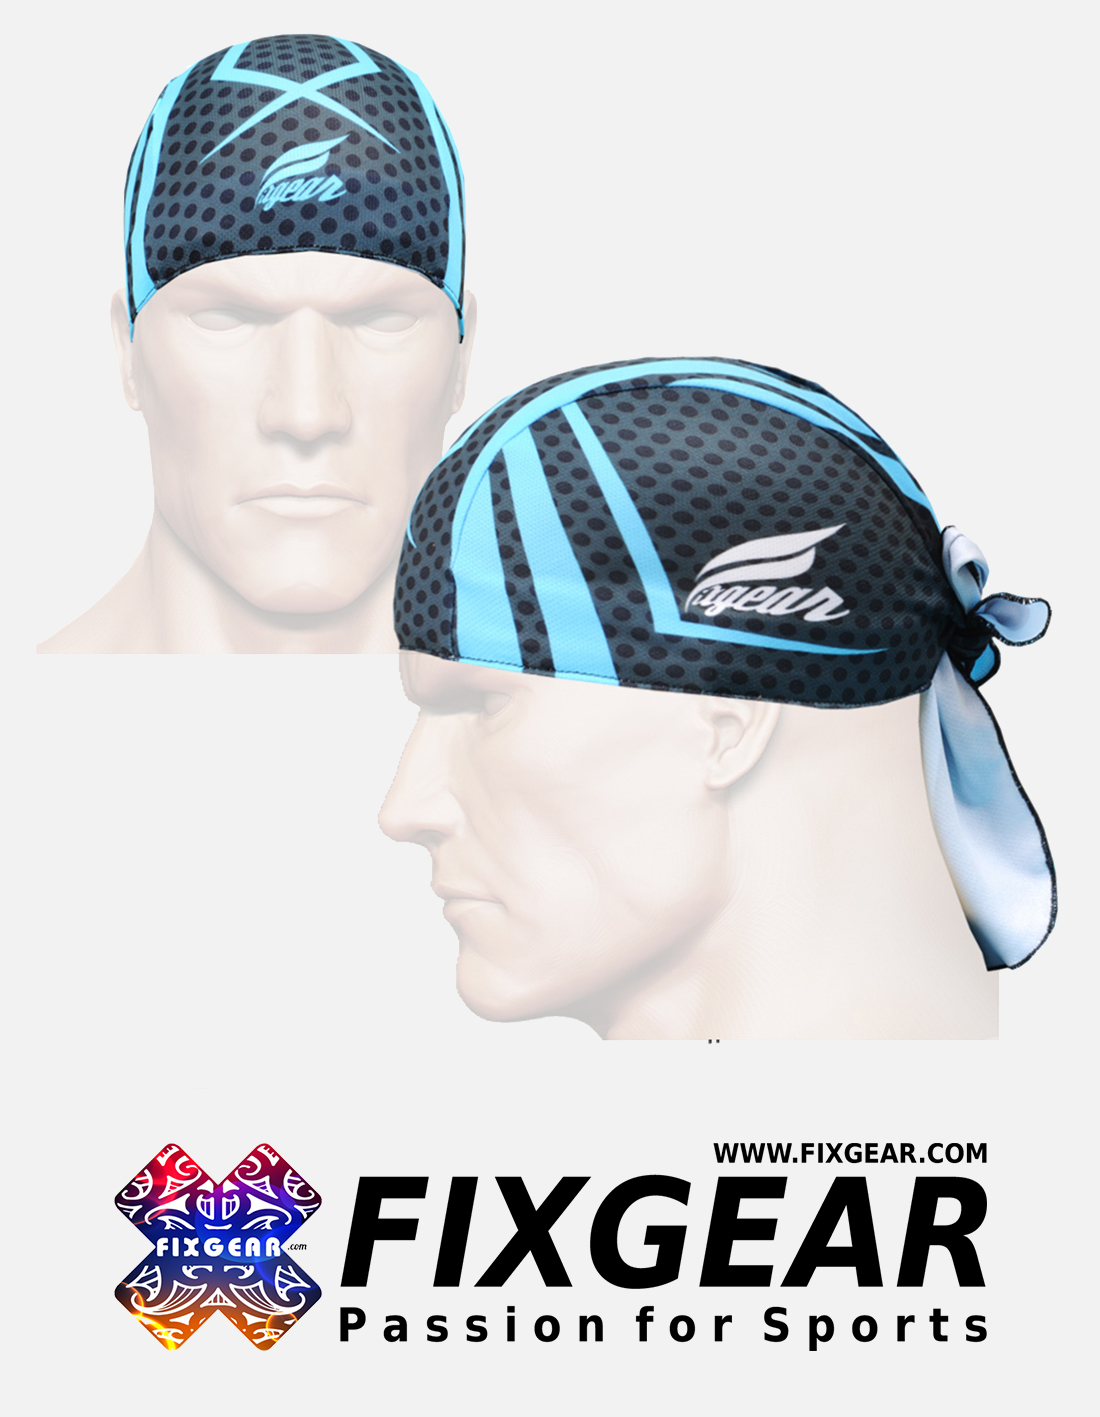 FIXGEAR D-56 Cycling Skull cap, Bandana